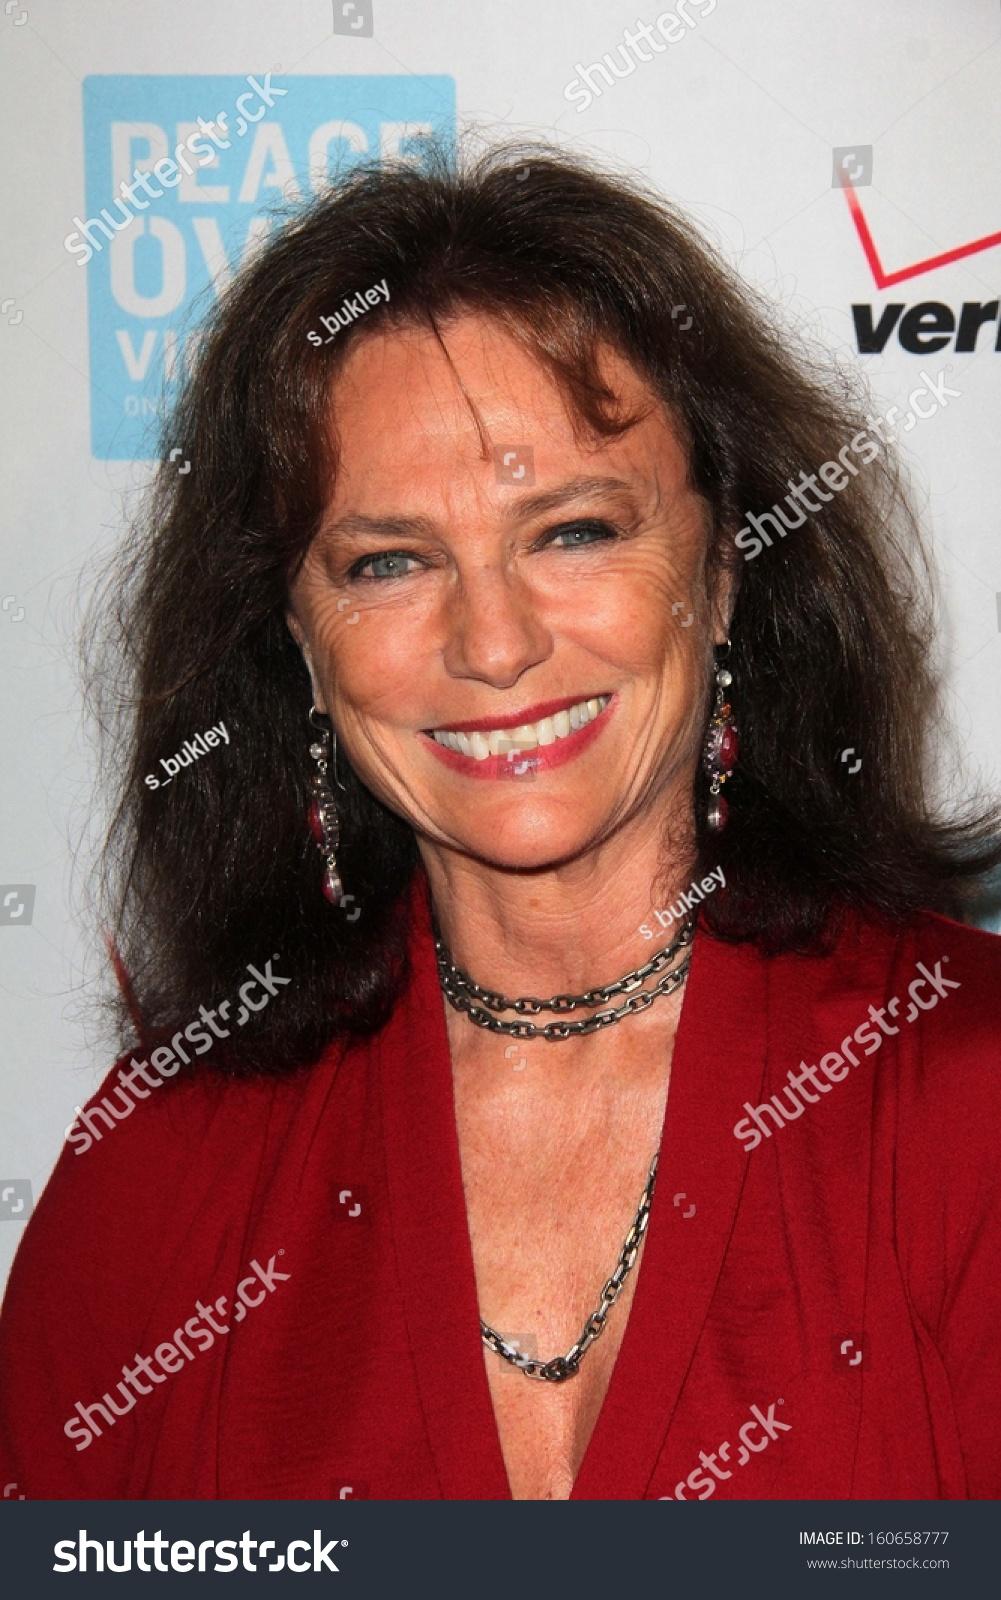 Jacqueline Bisset Peace Over Violence 42nd Stock Photo Edit Now